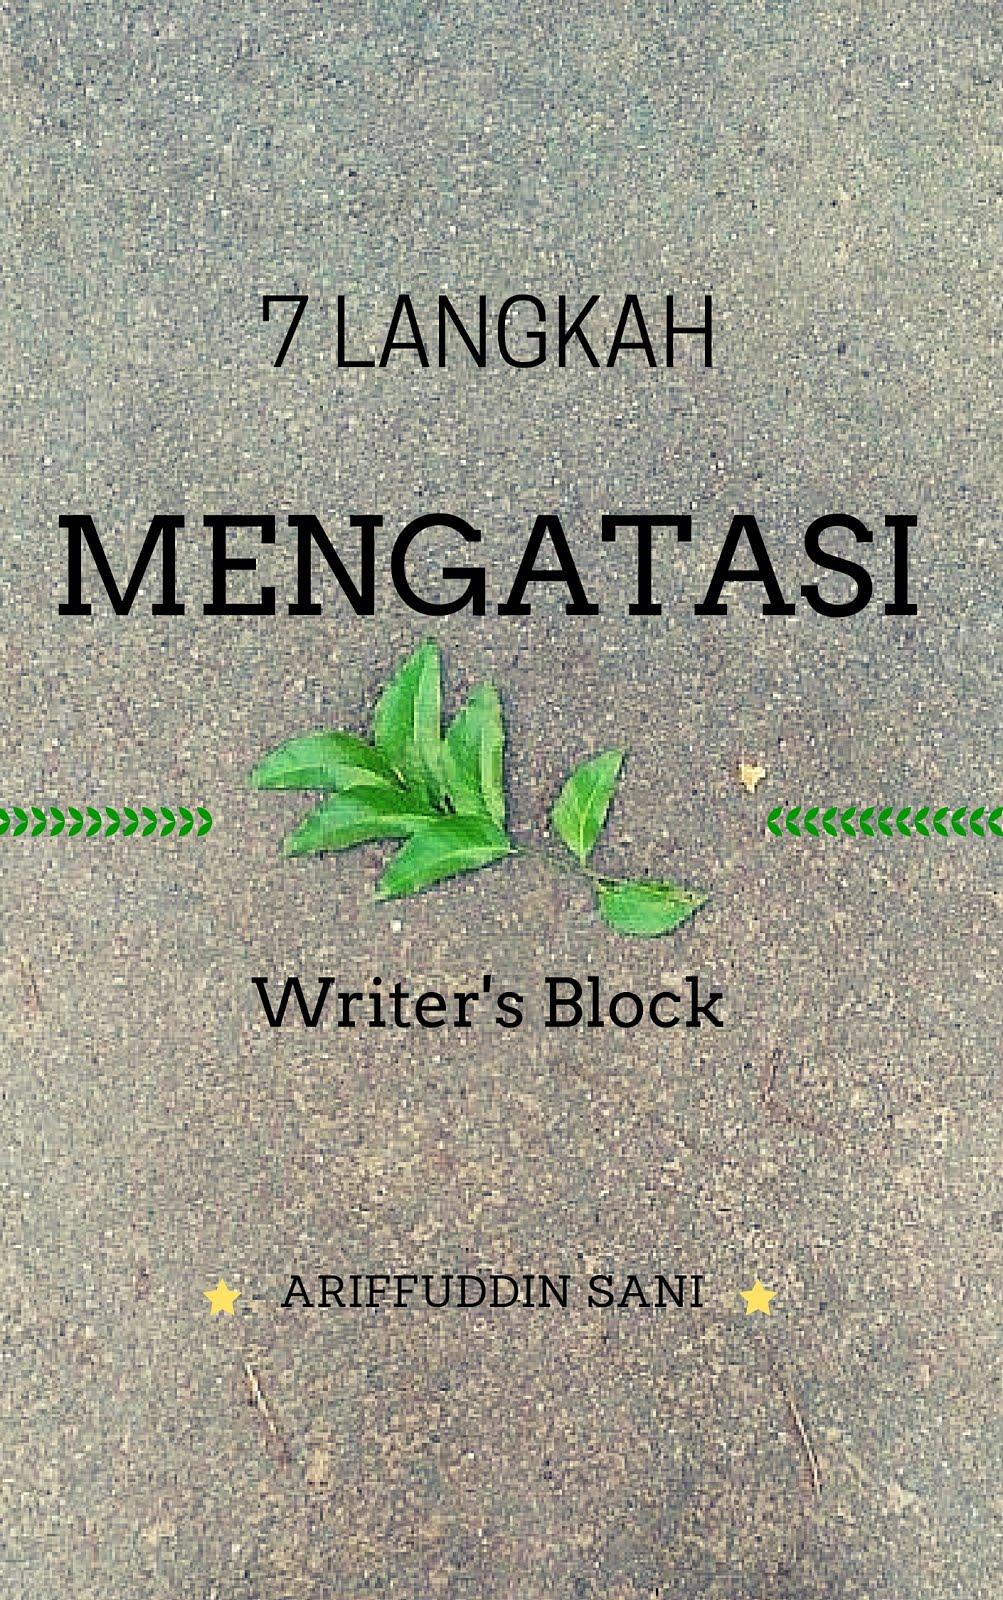 7 Langkah Mengatasi Writer's Block